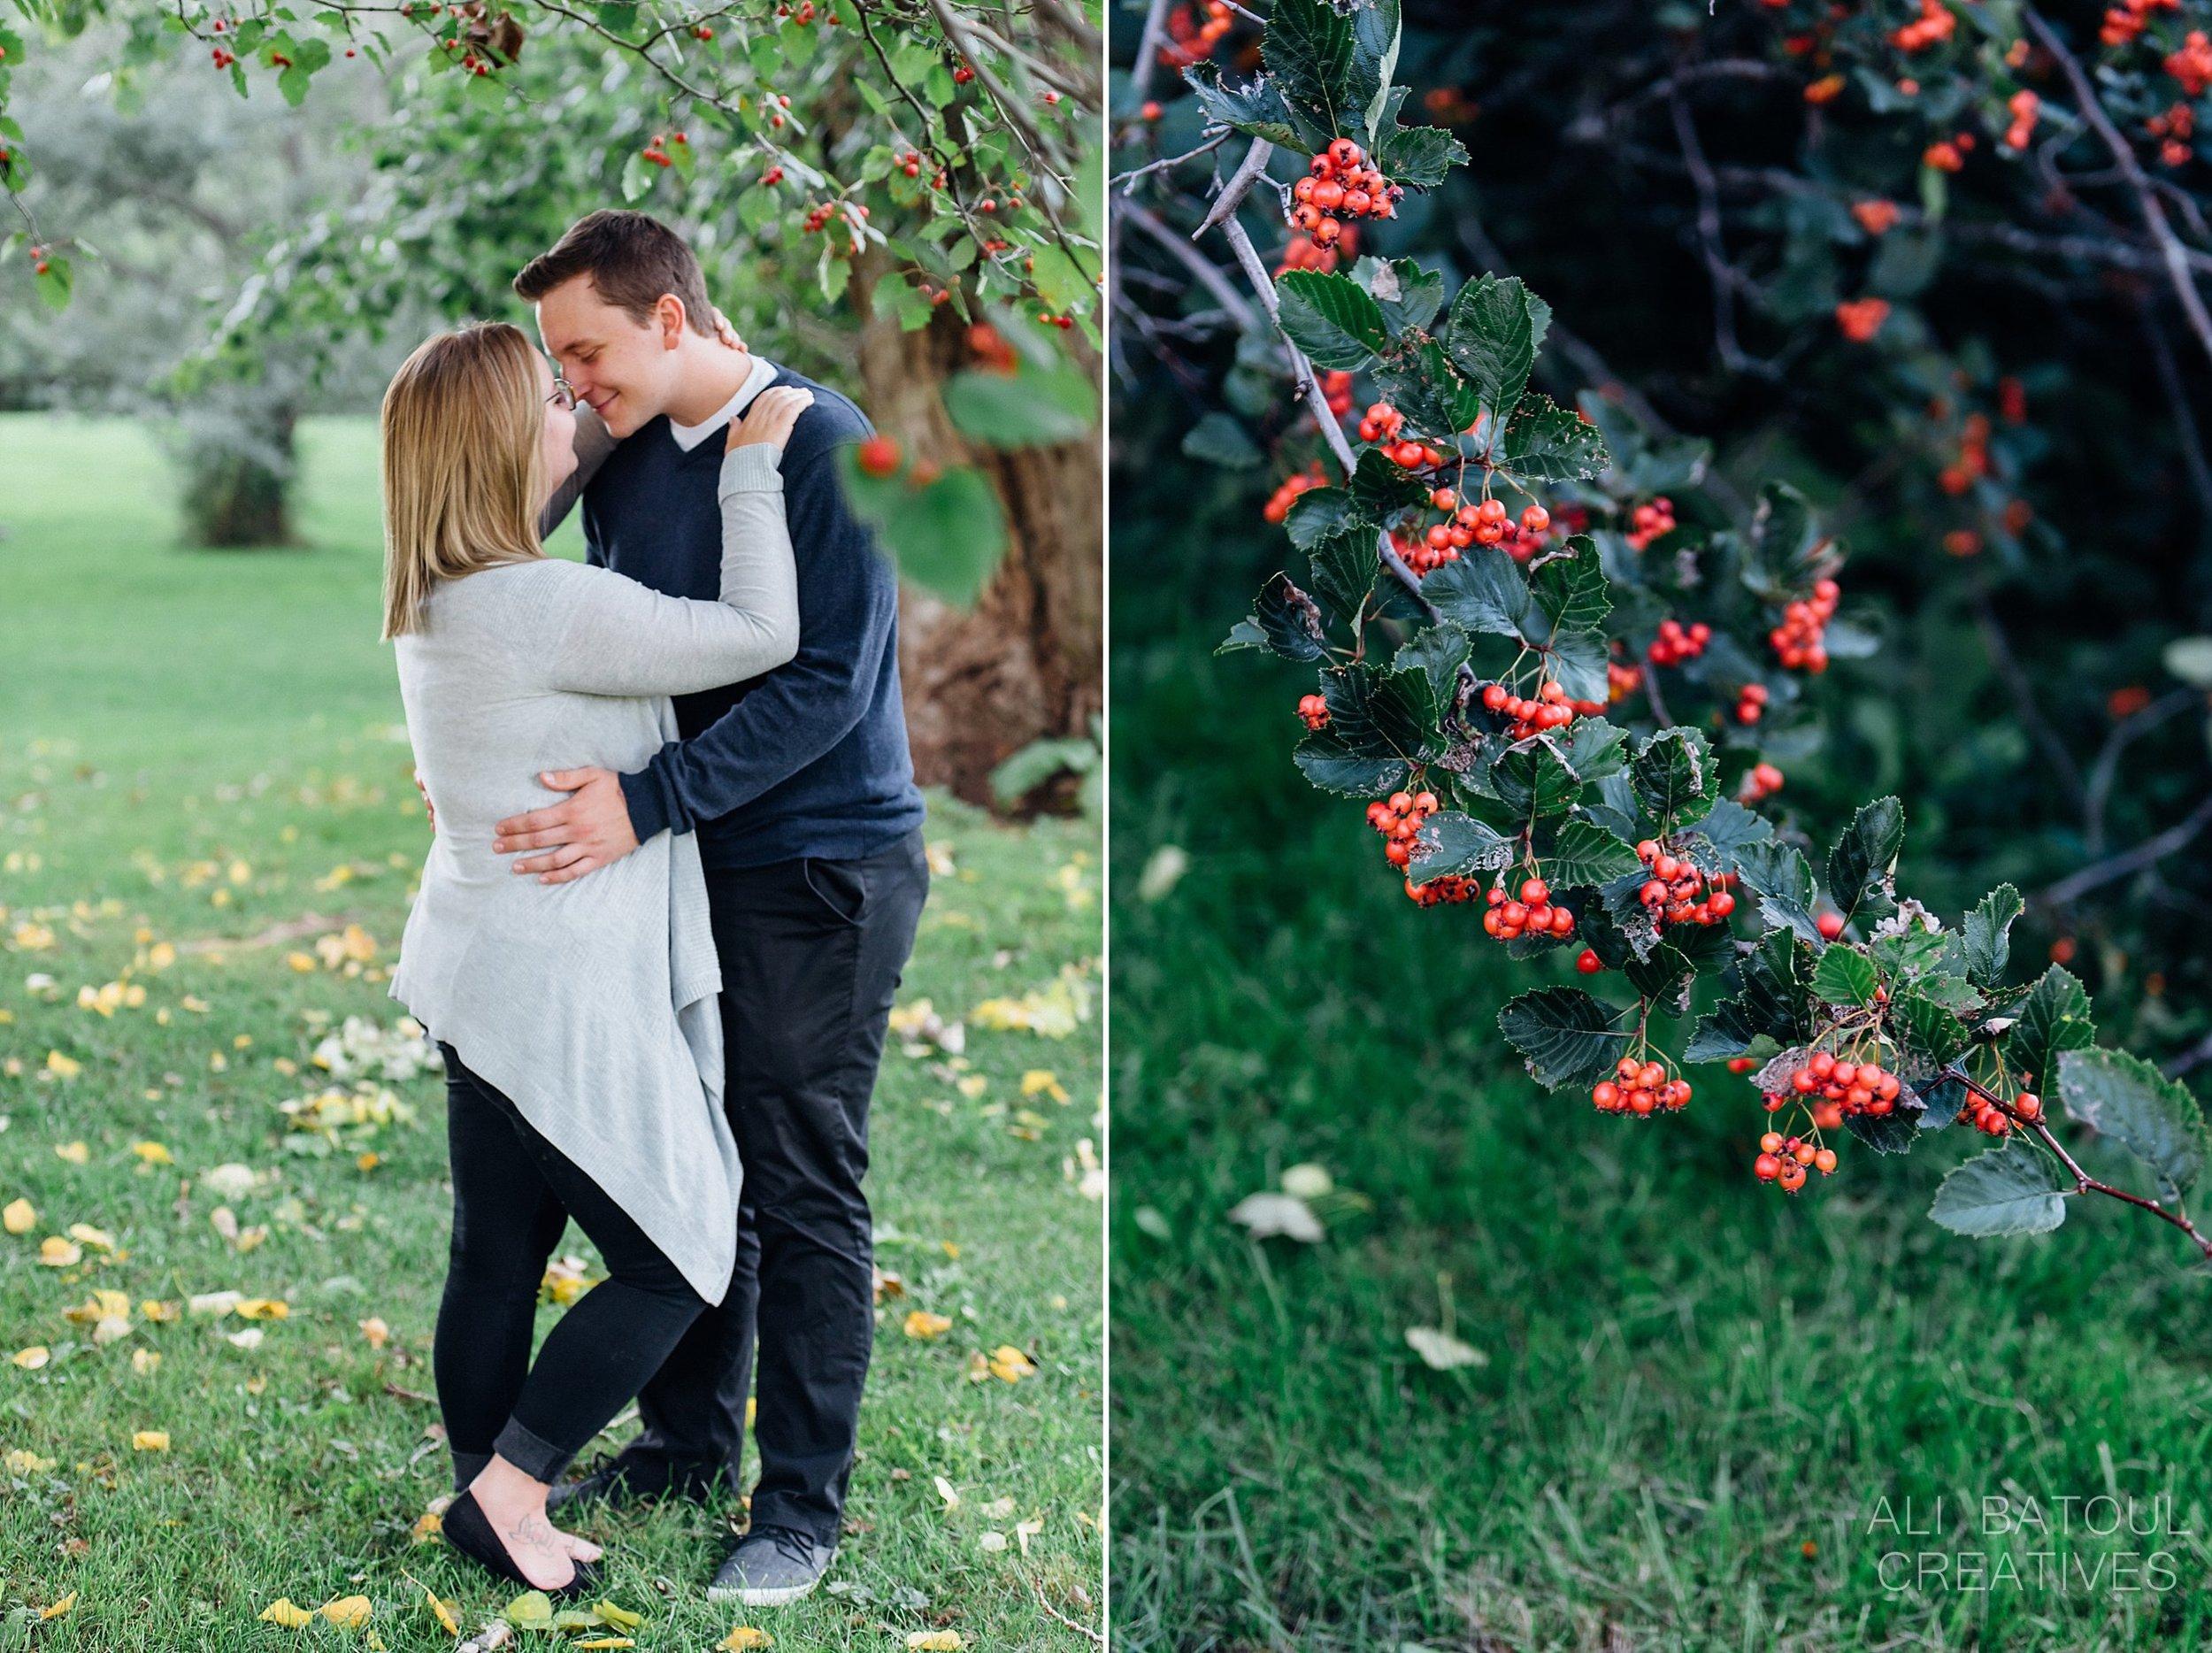 Natasha + Rich Ottawa Arboretum Engagement Photos - Ali and Batoul Fine Art Wedding Photography_0027.jpg